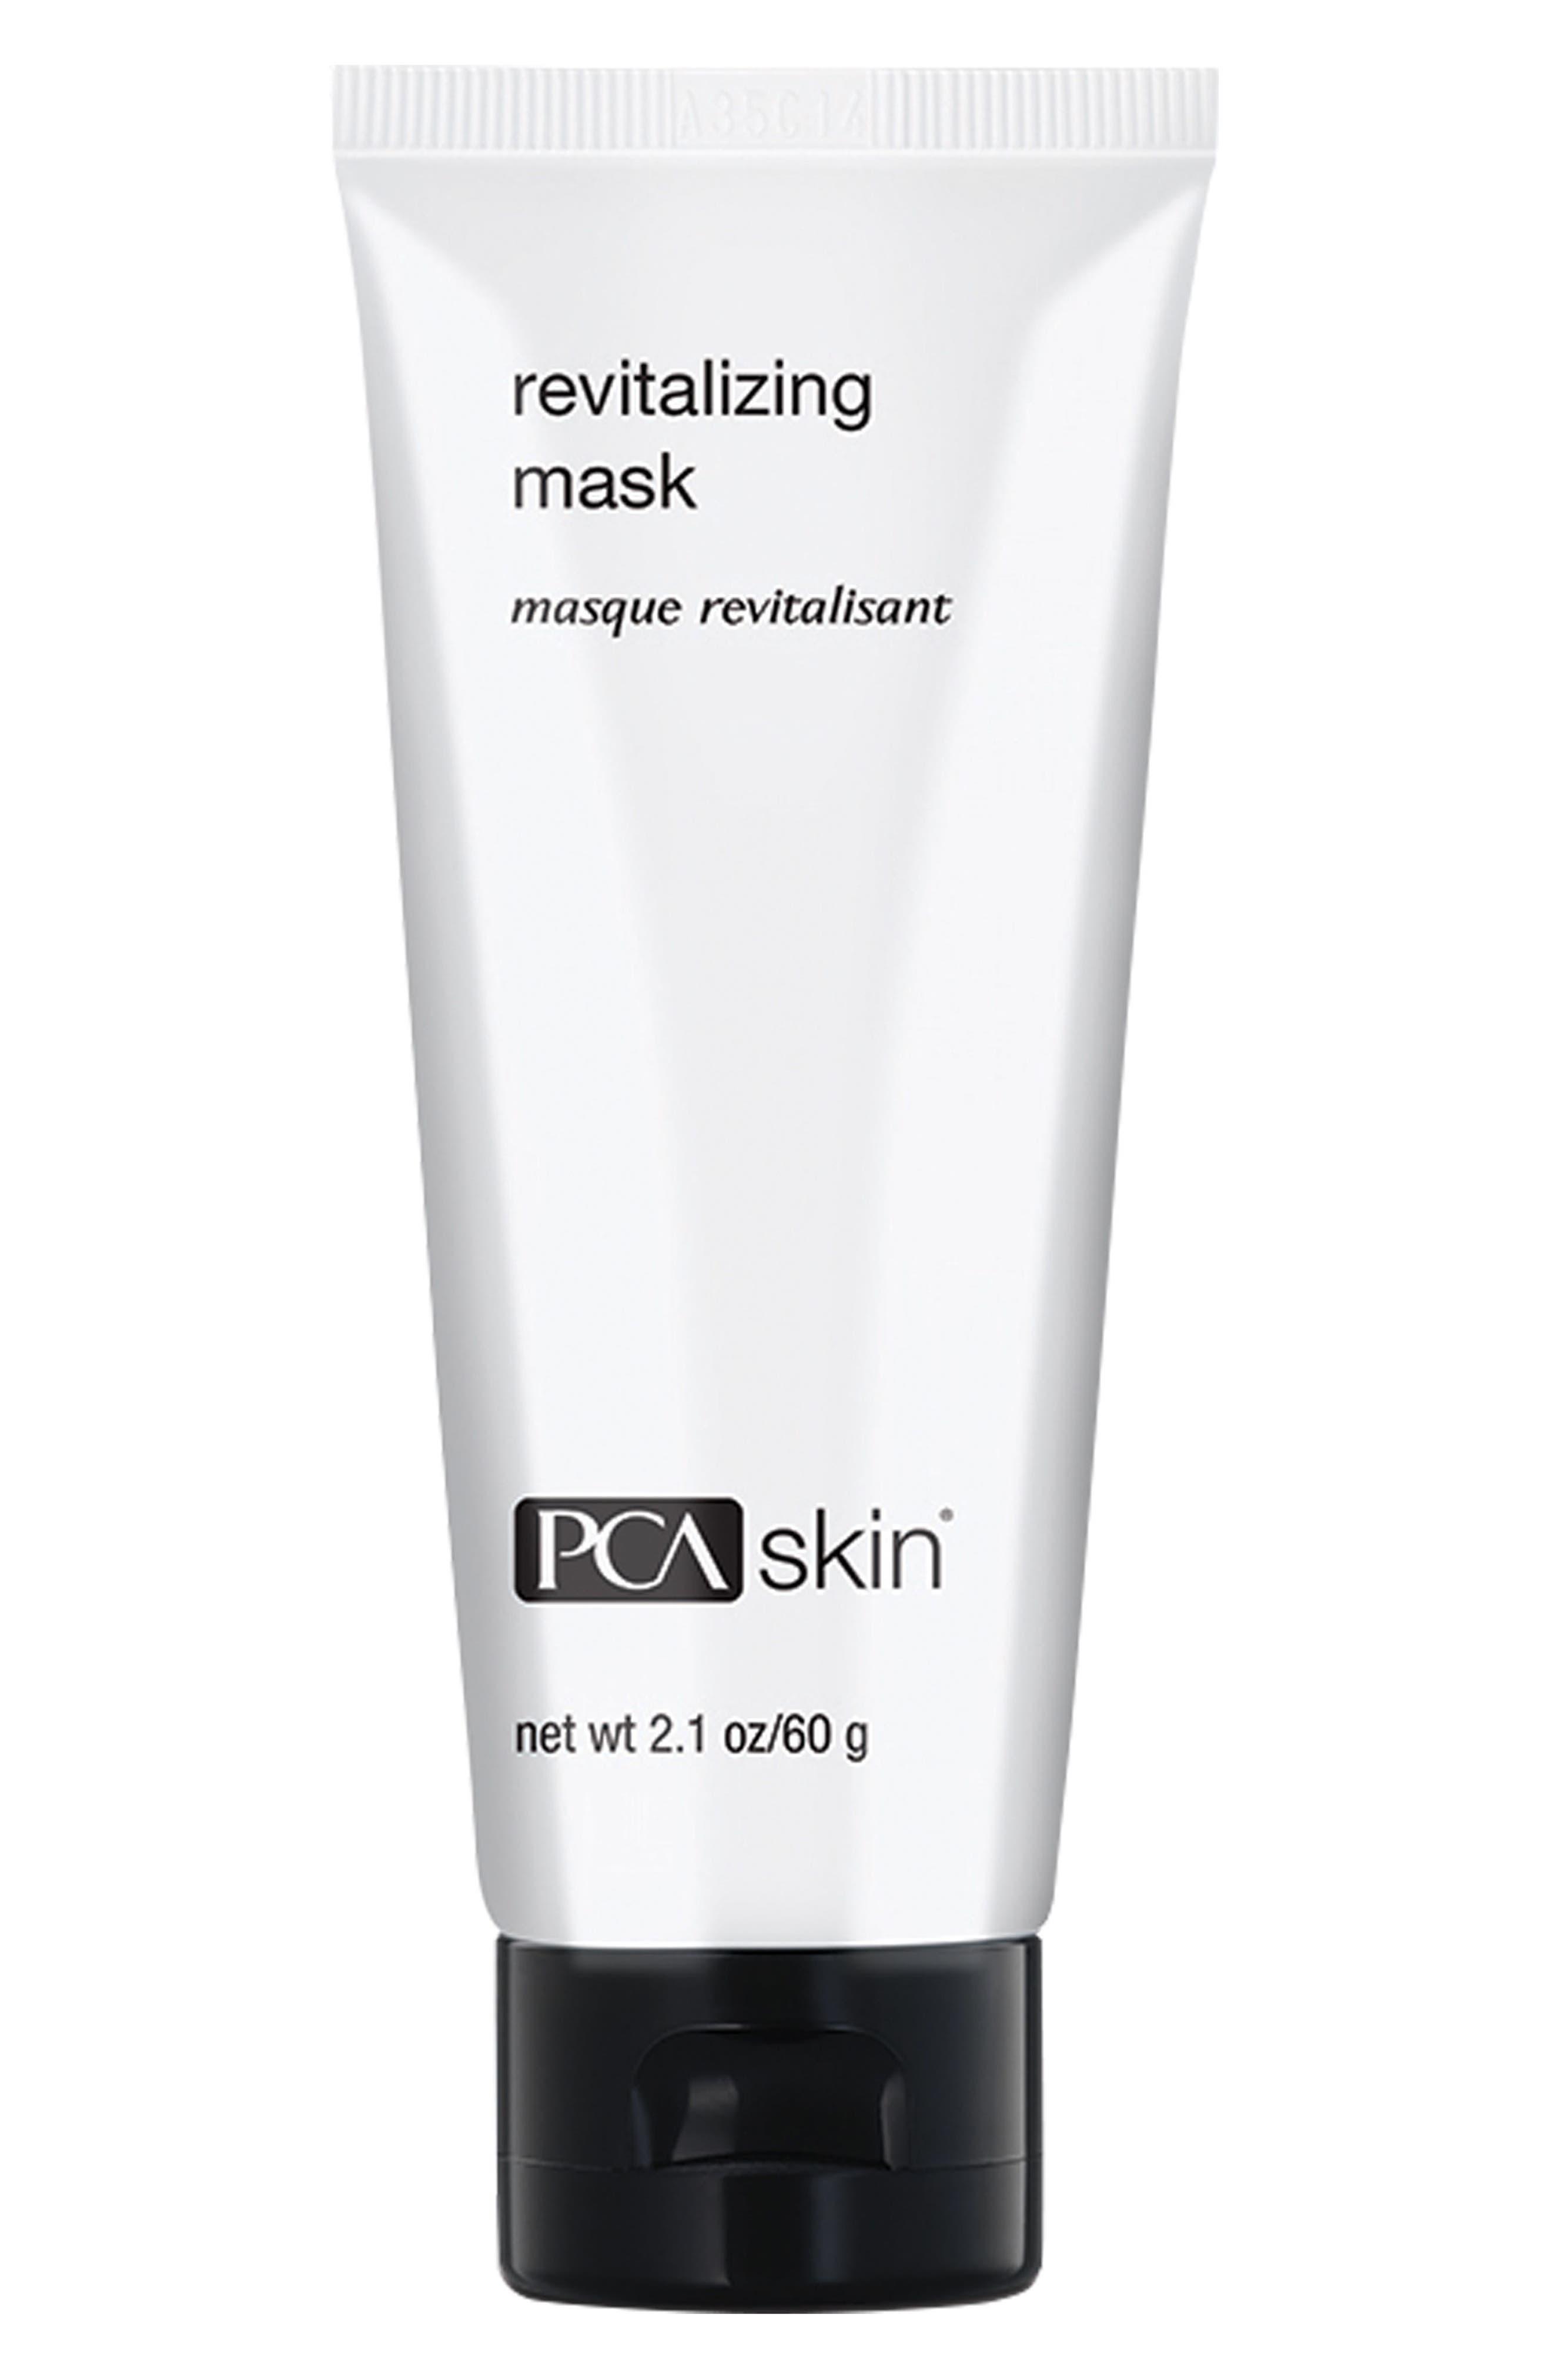 Alternate Image 1 Selected - PCA SKIN Revitalizing Mask